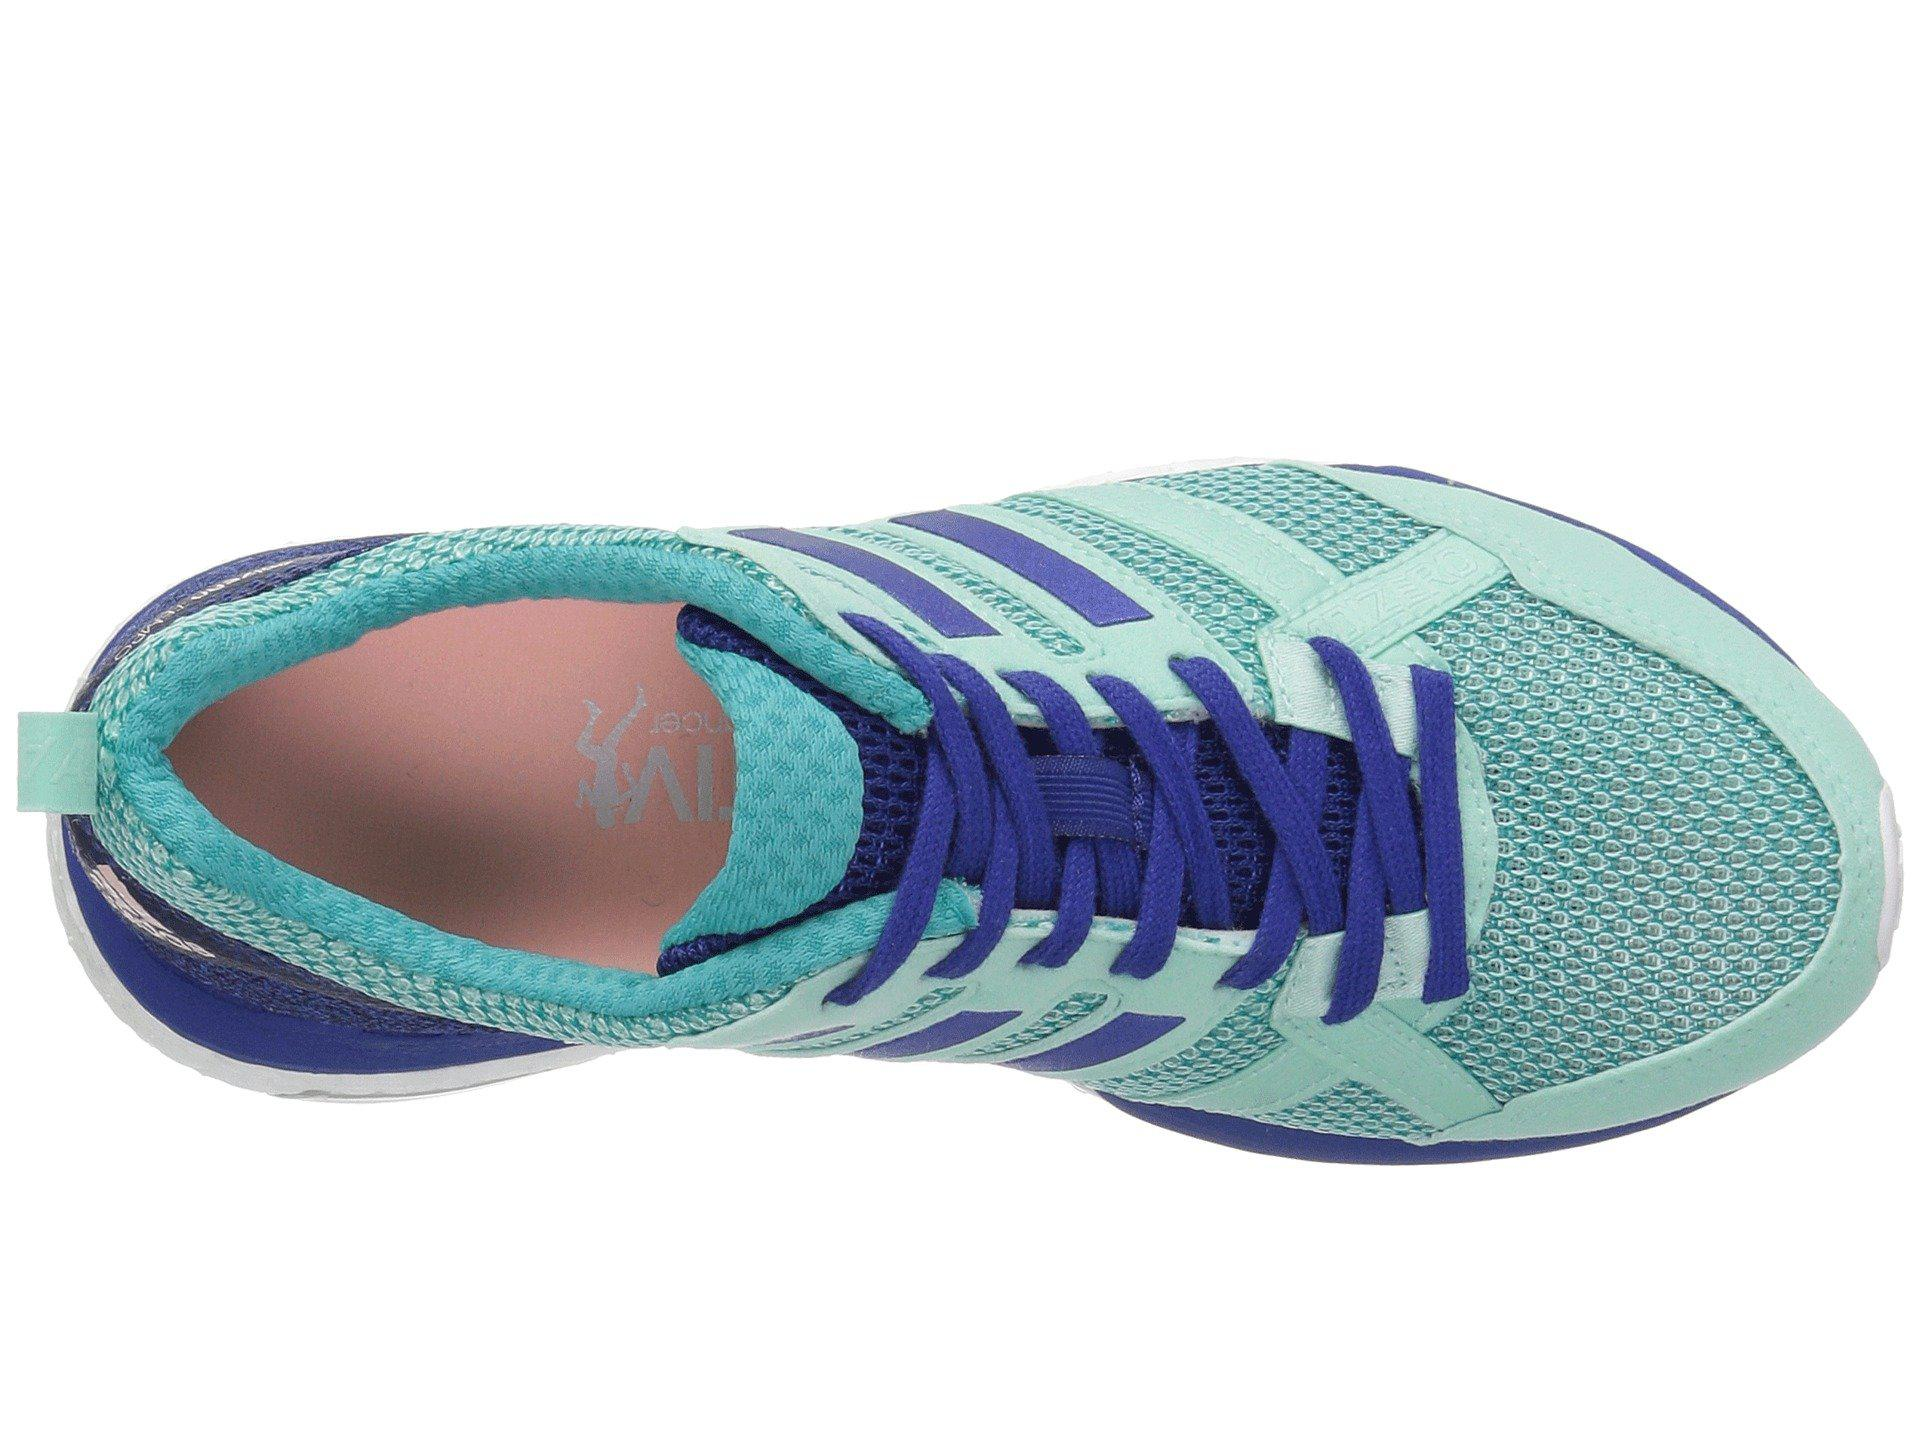 best service 16069 76457 Adidas Originals - Blue Adizero Tempo 9 (grey Tworeal Lilacmystery Ink.  View fullscreen